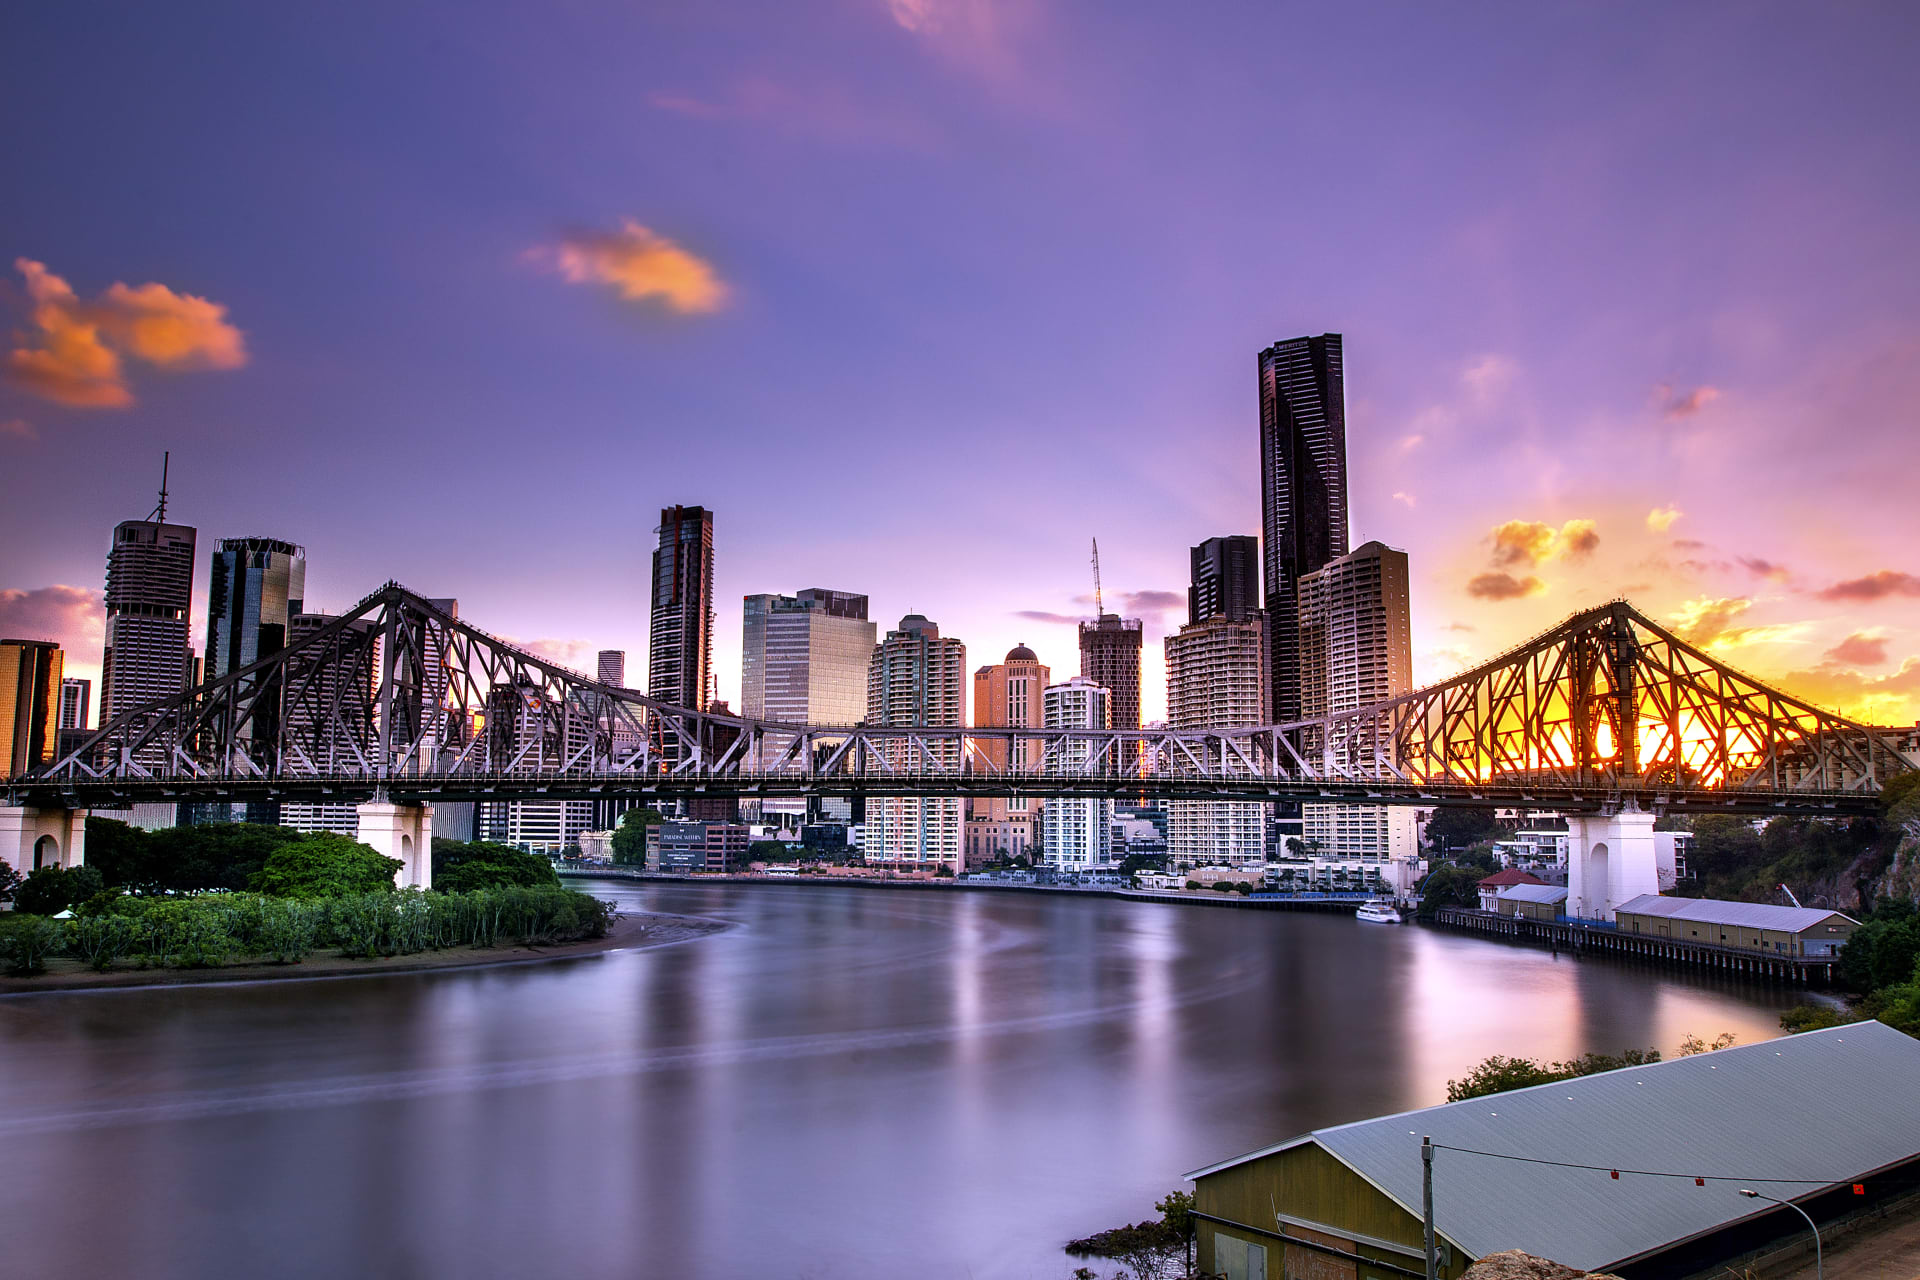 Brisbane - The Story Bridge: Brisbane's iconic bridge